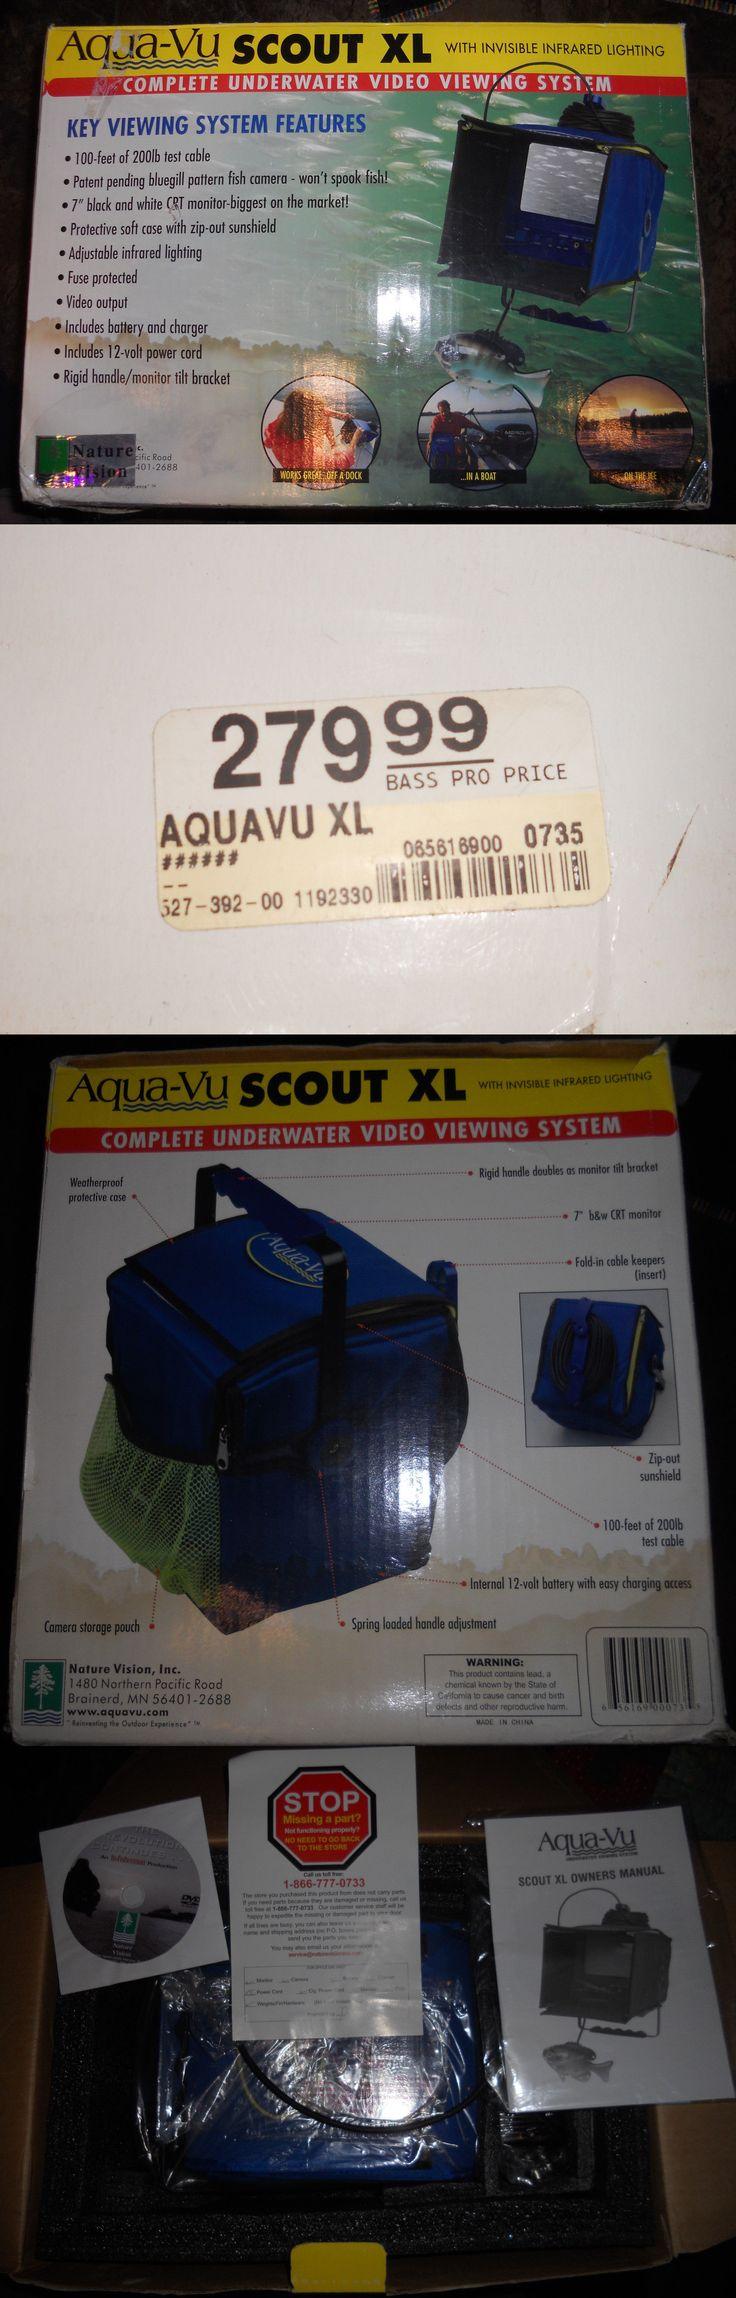 Underwater Cameras 180000: Aqua-Vu Scout Xl Underwater Video Camera Complete Underwater Video Vewing System -> BUY IT NOW ONLY: $119.99 on eBay!